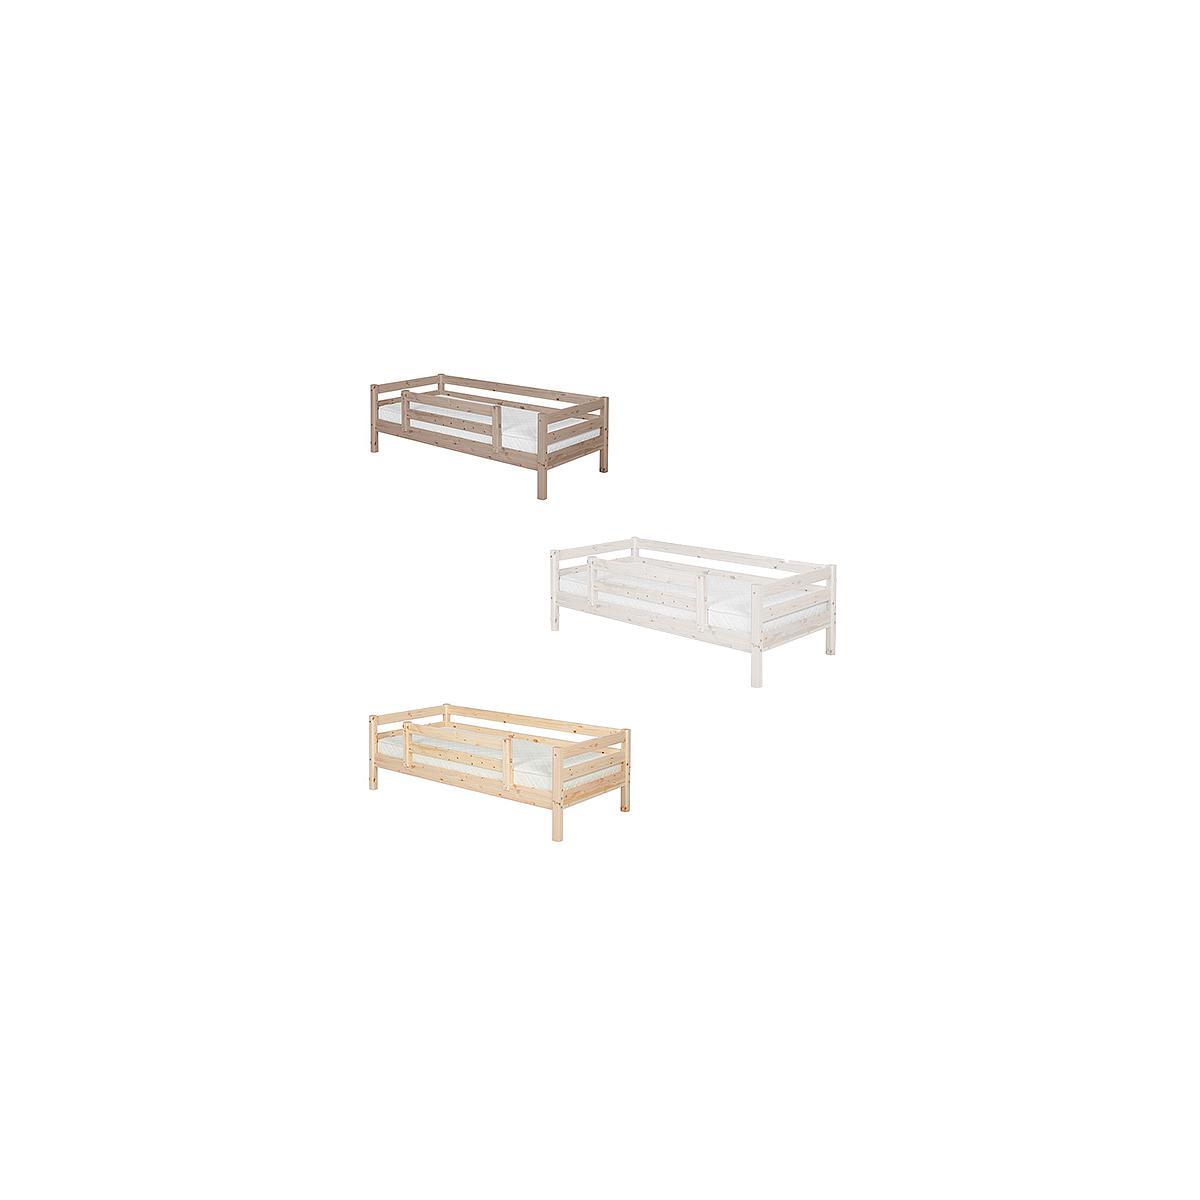 Cama individual barrera 1/2 90x200 CLASSIC Flexa terra